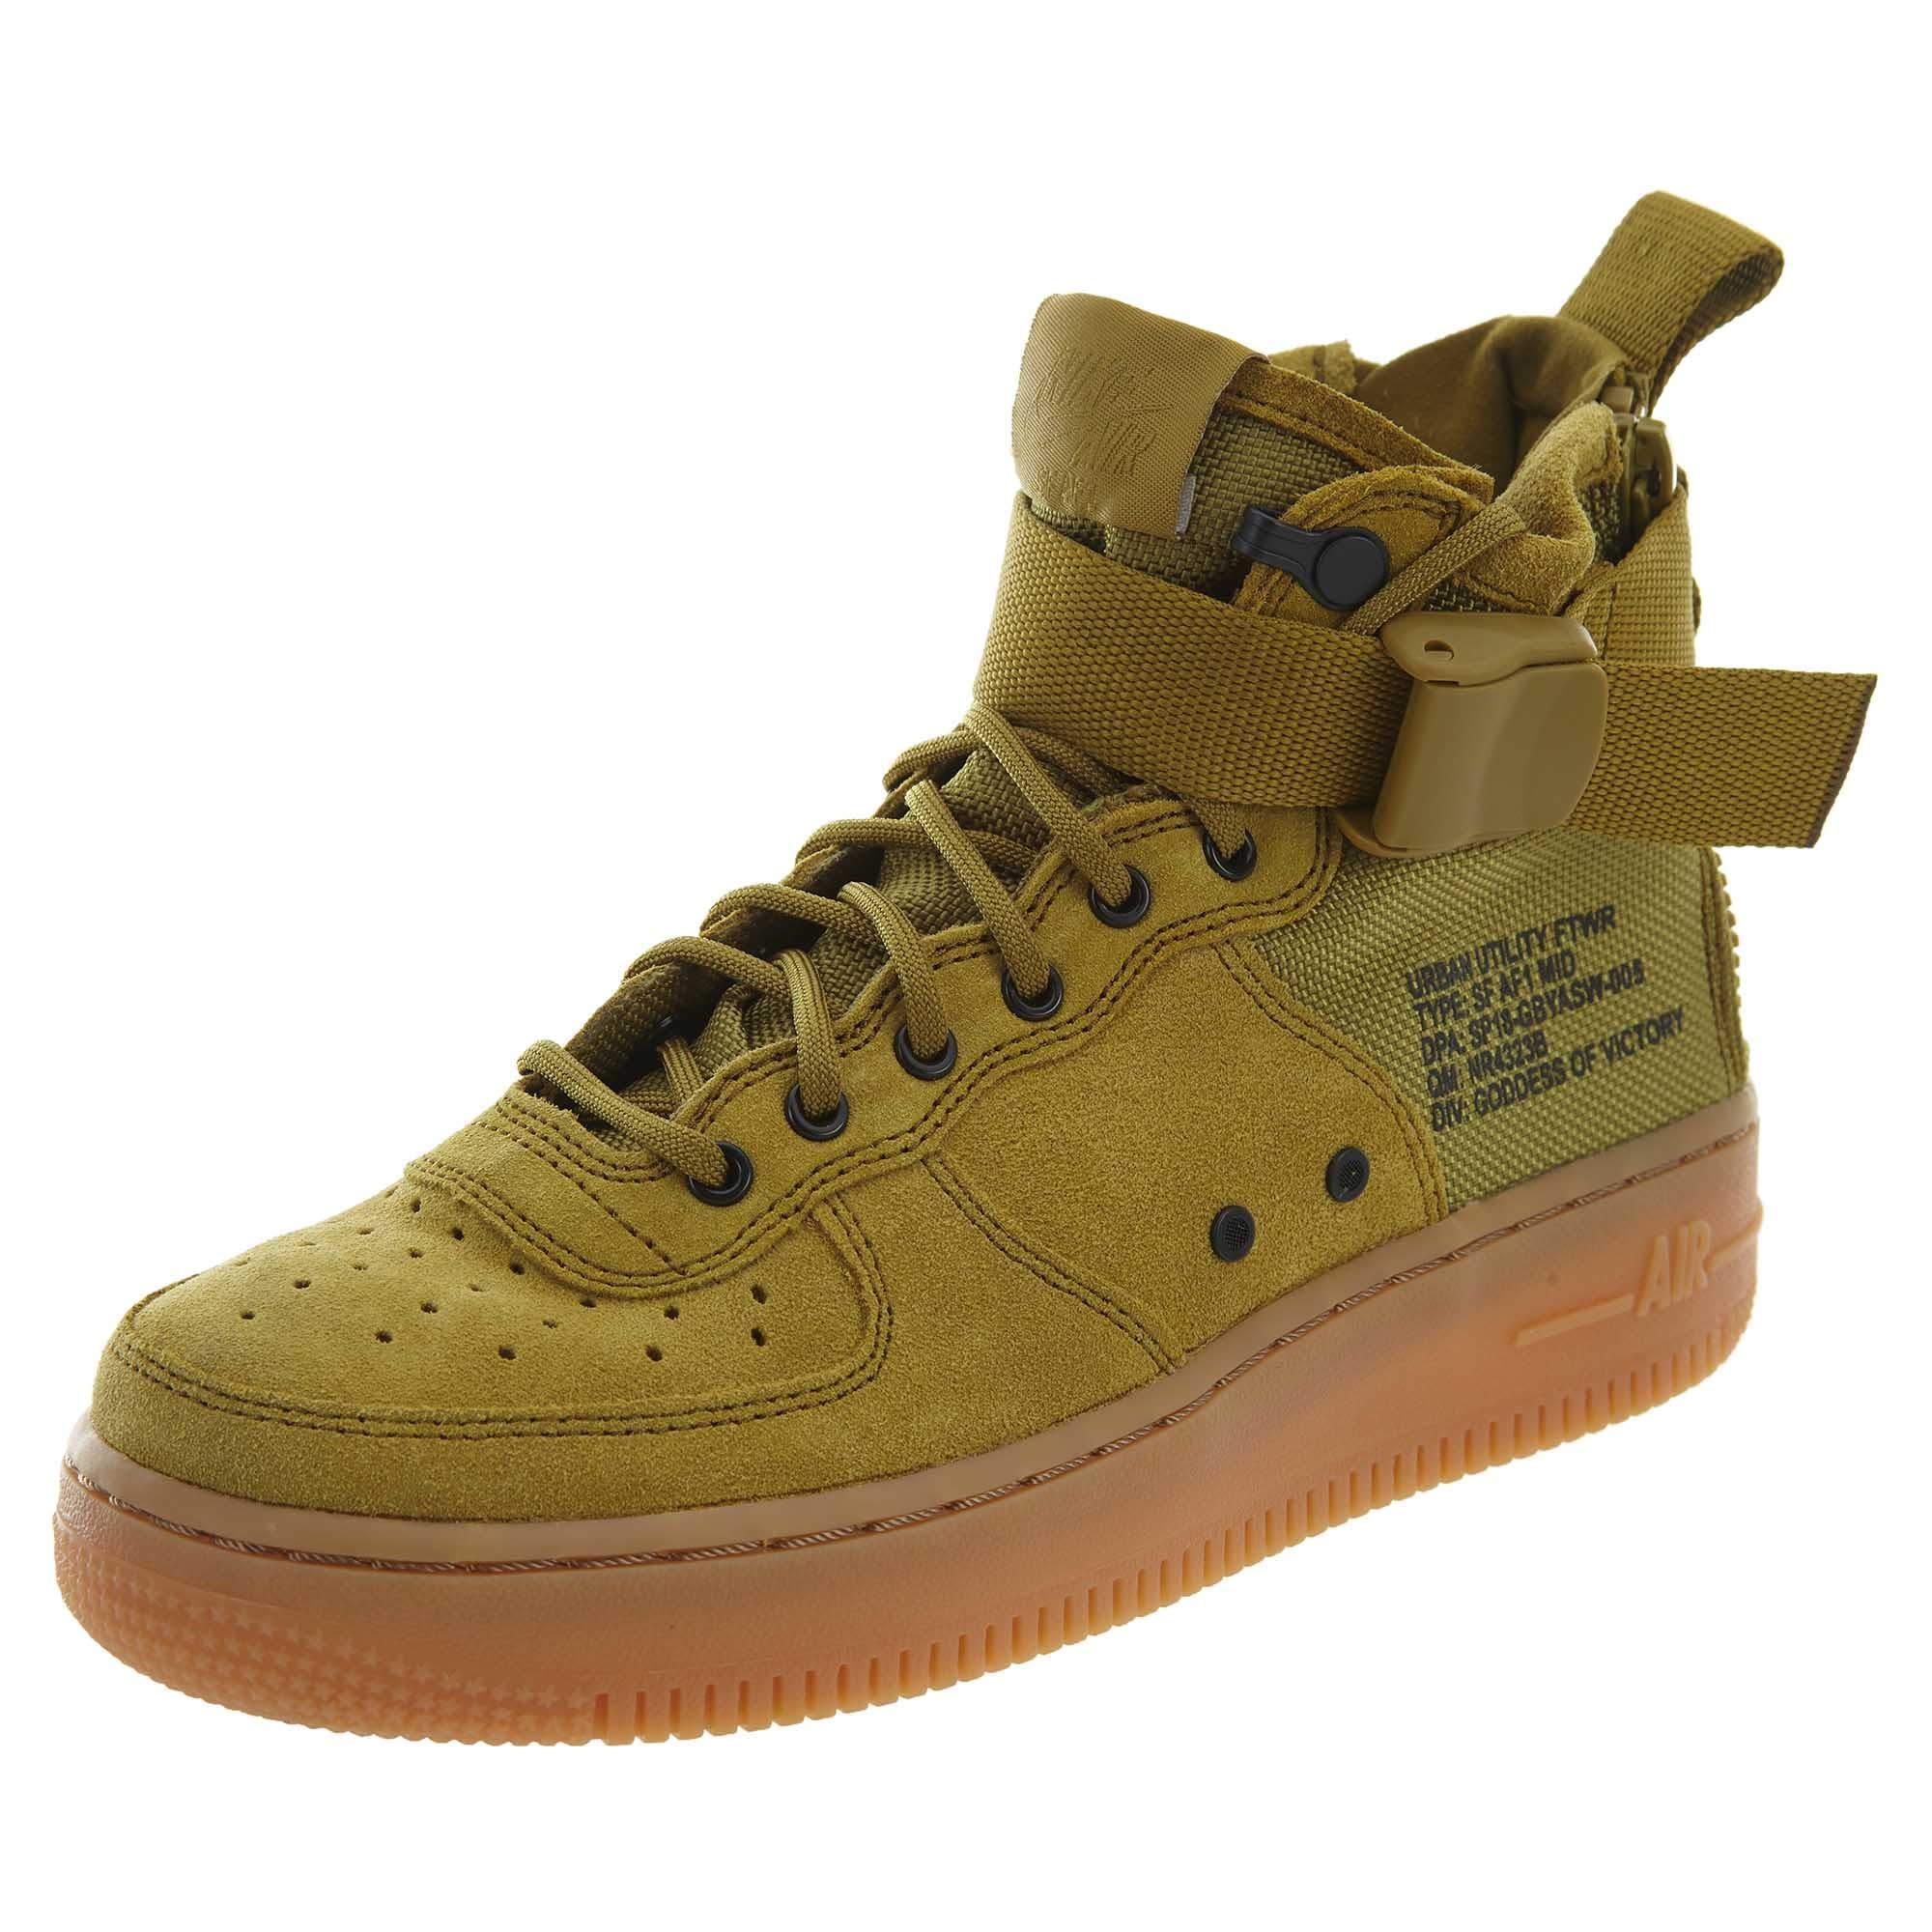 Nike Sf Af1 Mid Big Kids Style: AJ0424-300 Size: 4